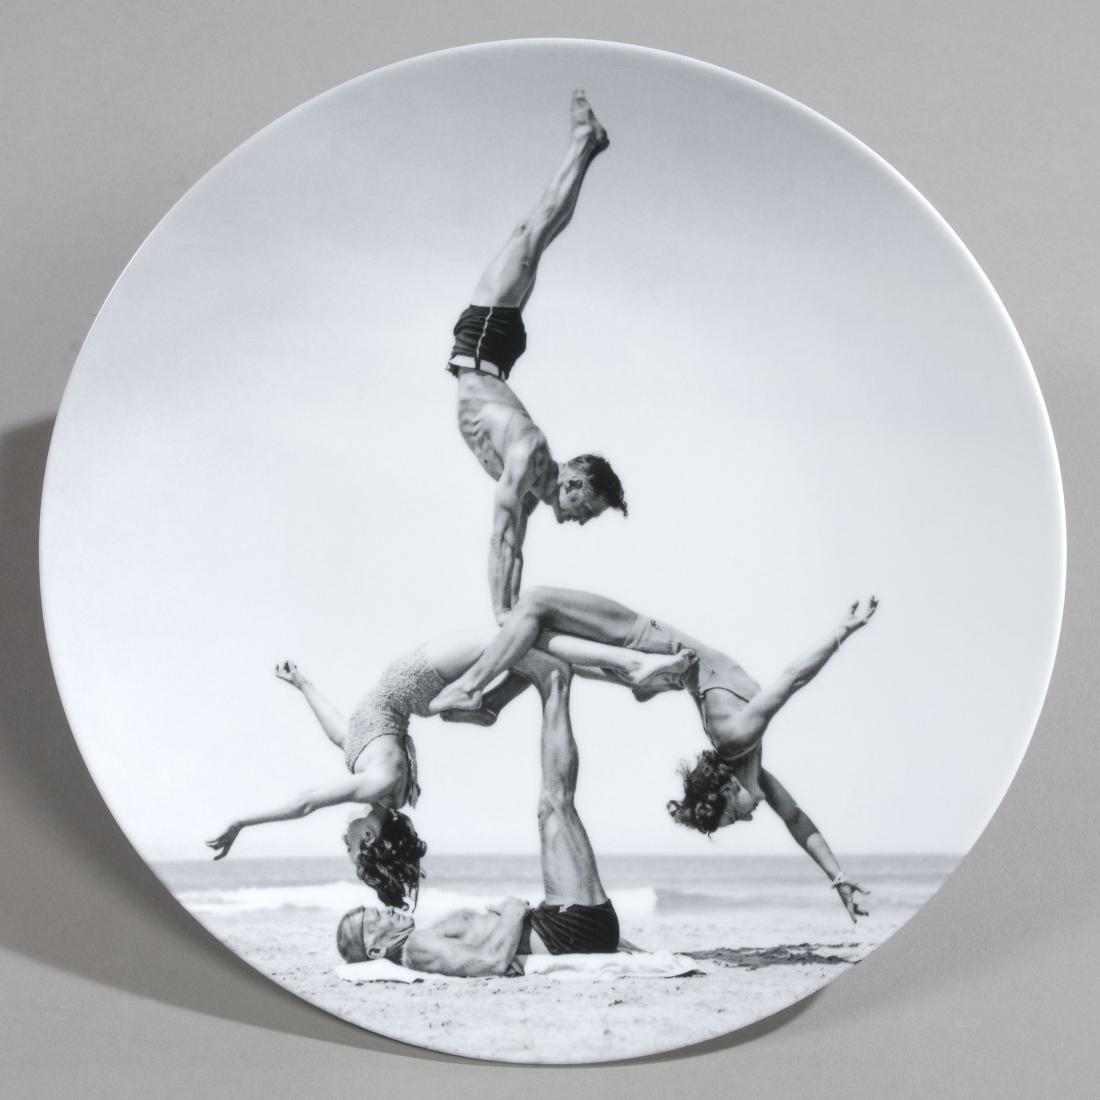 Jeff KOONS (1955) Acrobates. Utrop: 1 900 SEK. Arthena Auctions.